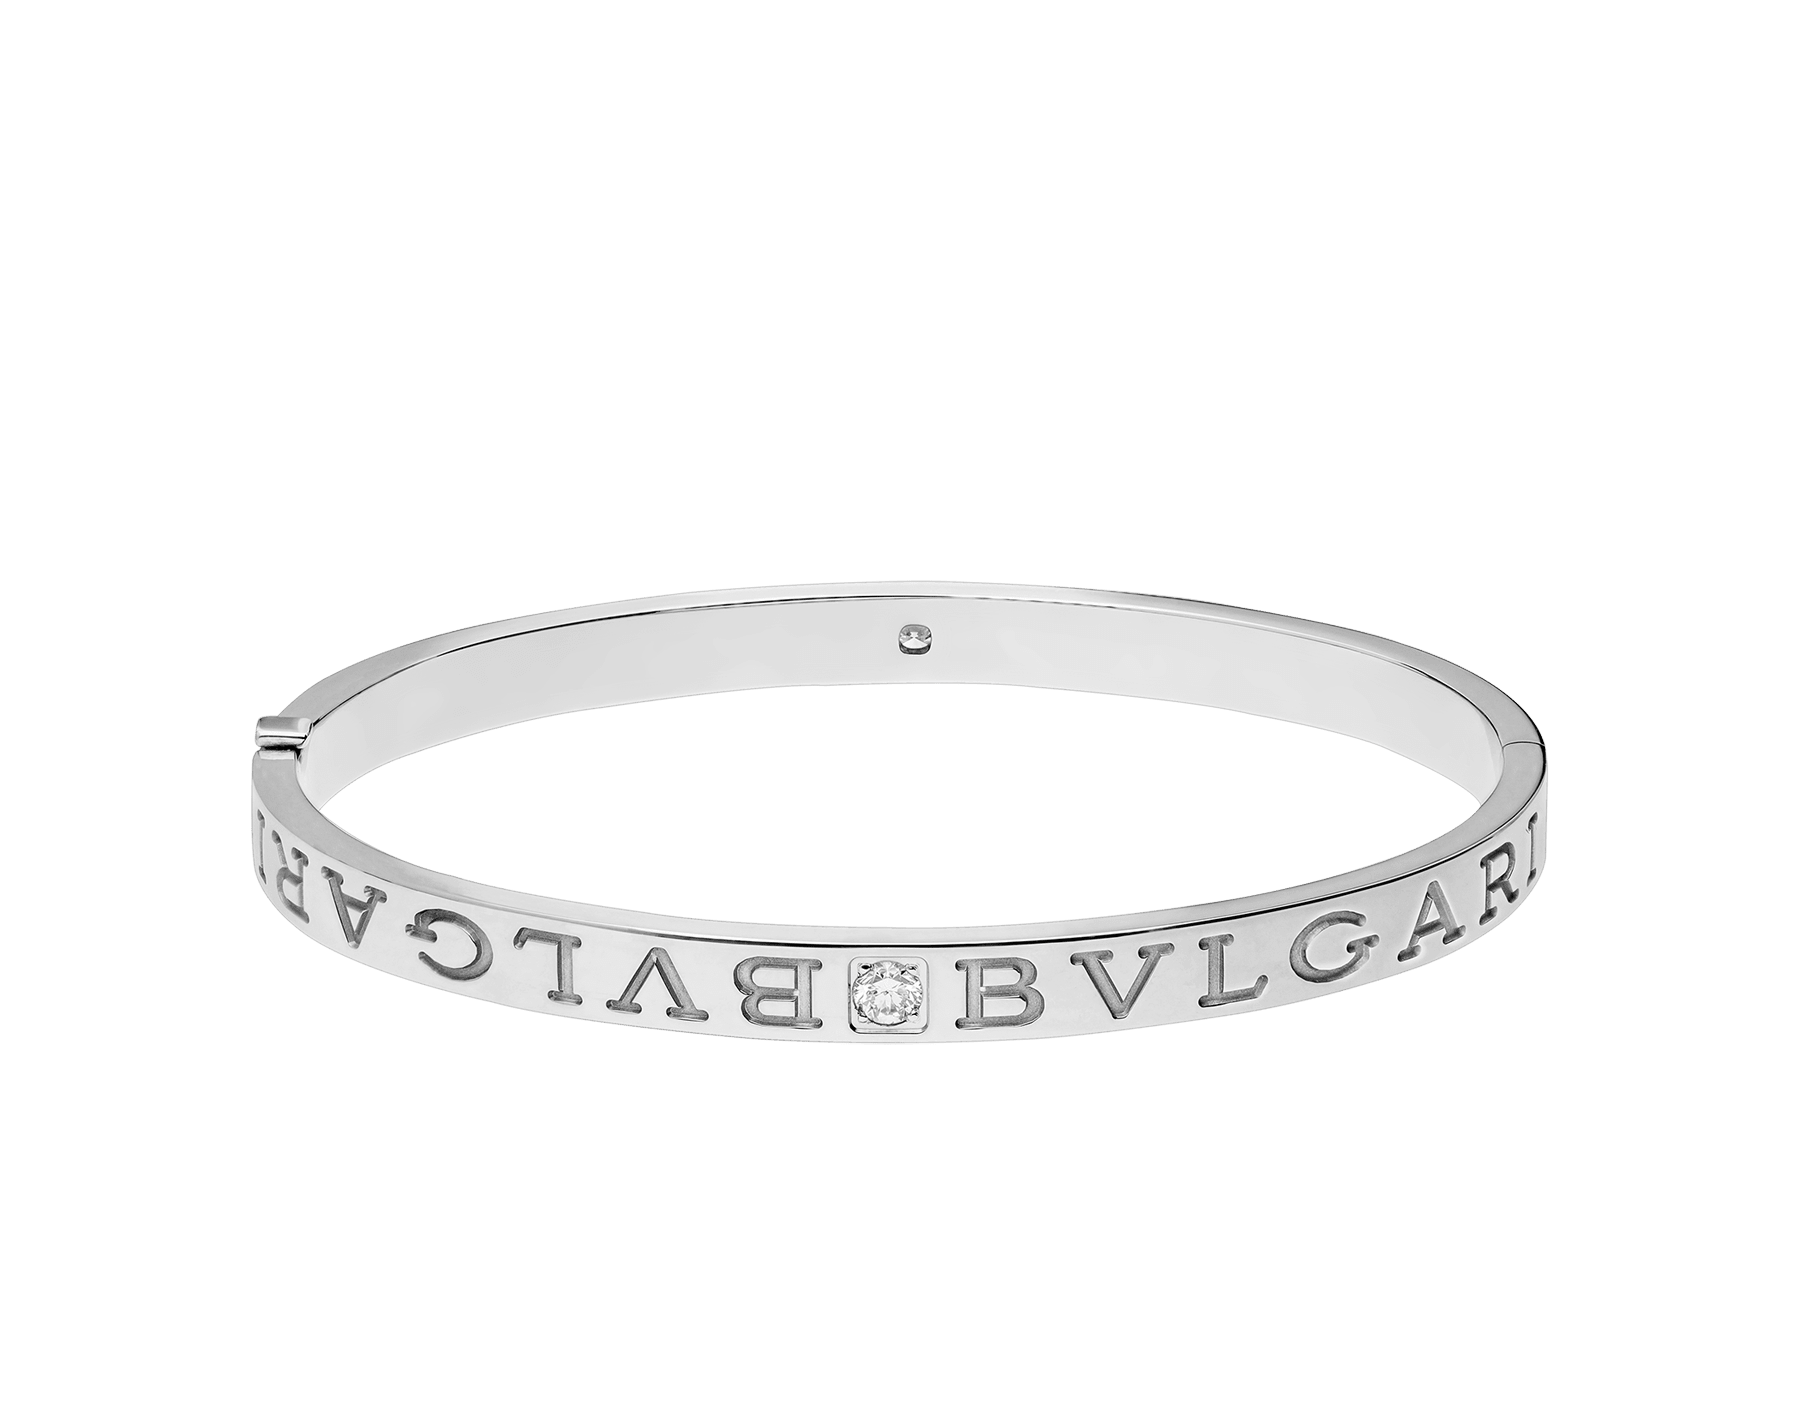 BVLGARI BVLGARI 18 kt white gold bangle bracelet set with diamonds BR856790 image 2